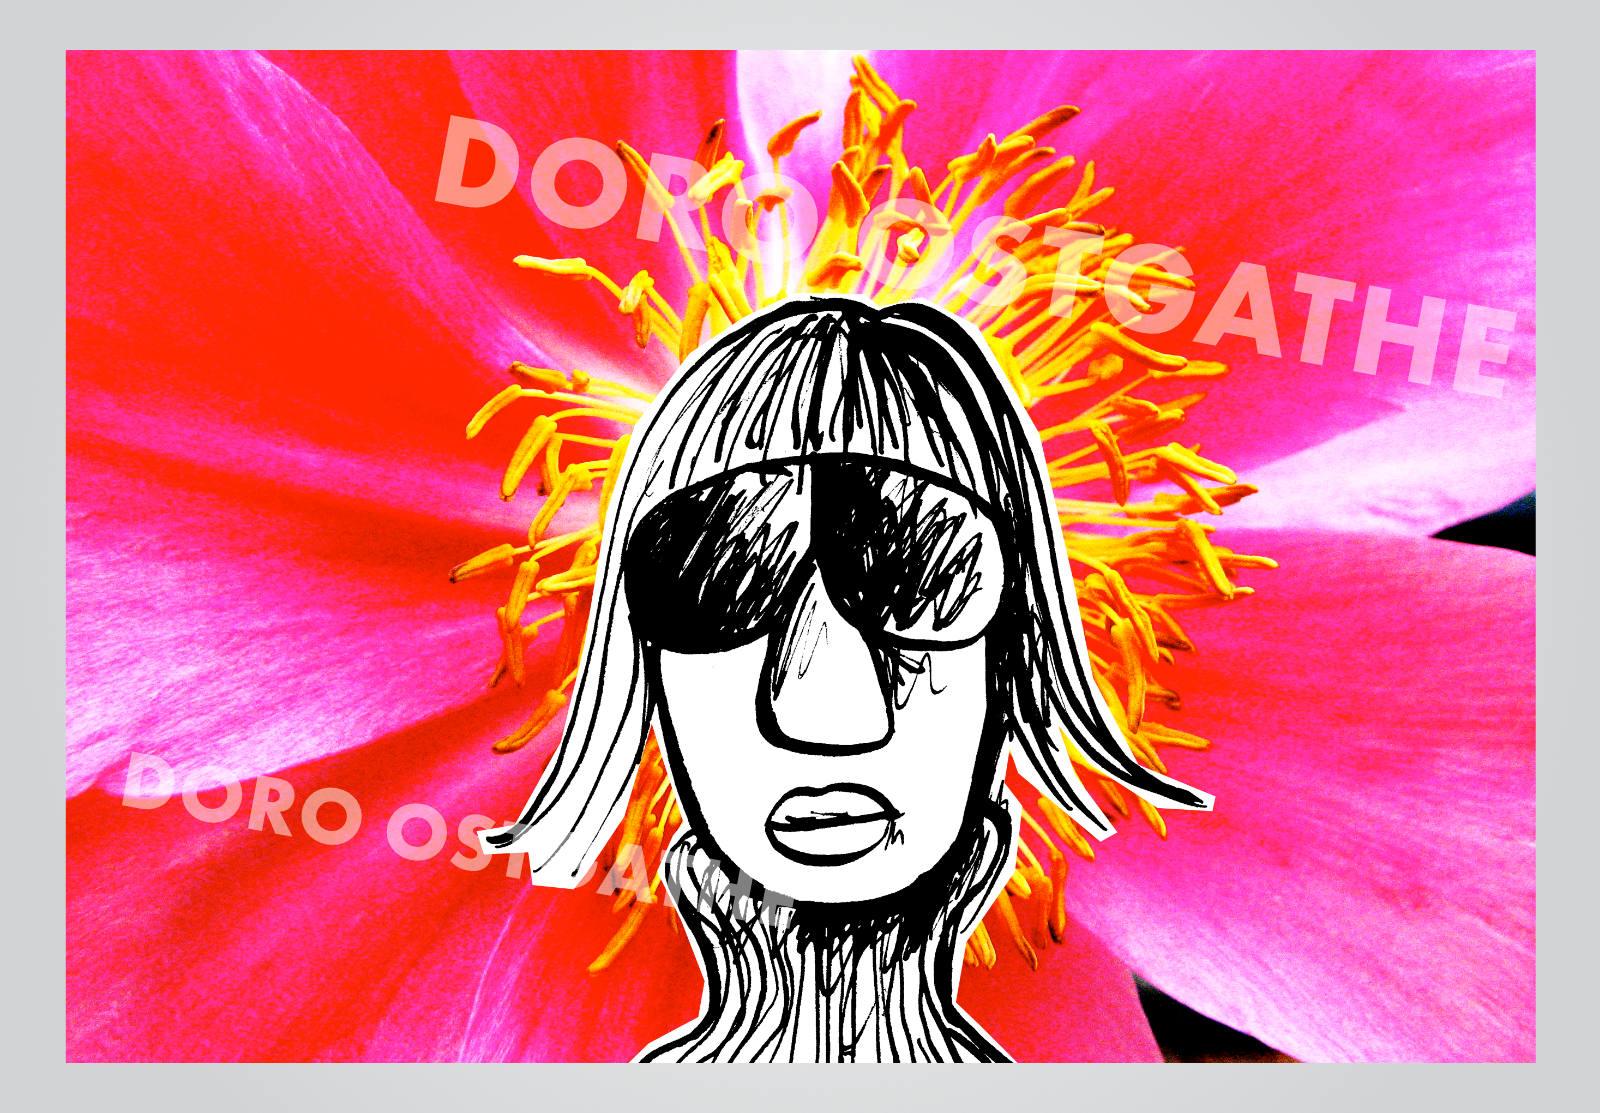 illustration-kunst-art-ostgathe-02.jpg